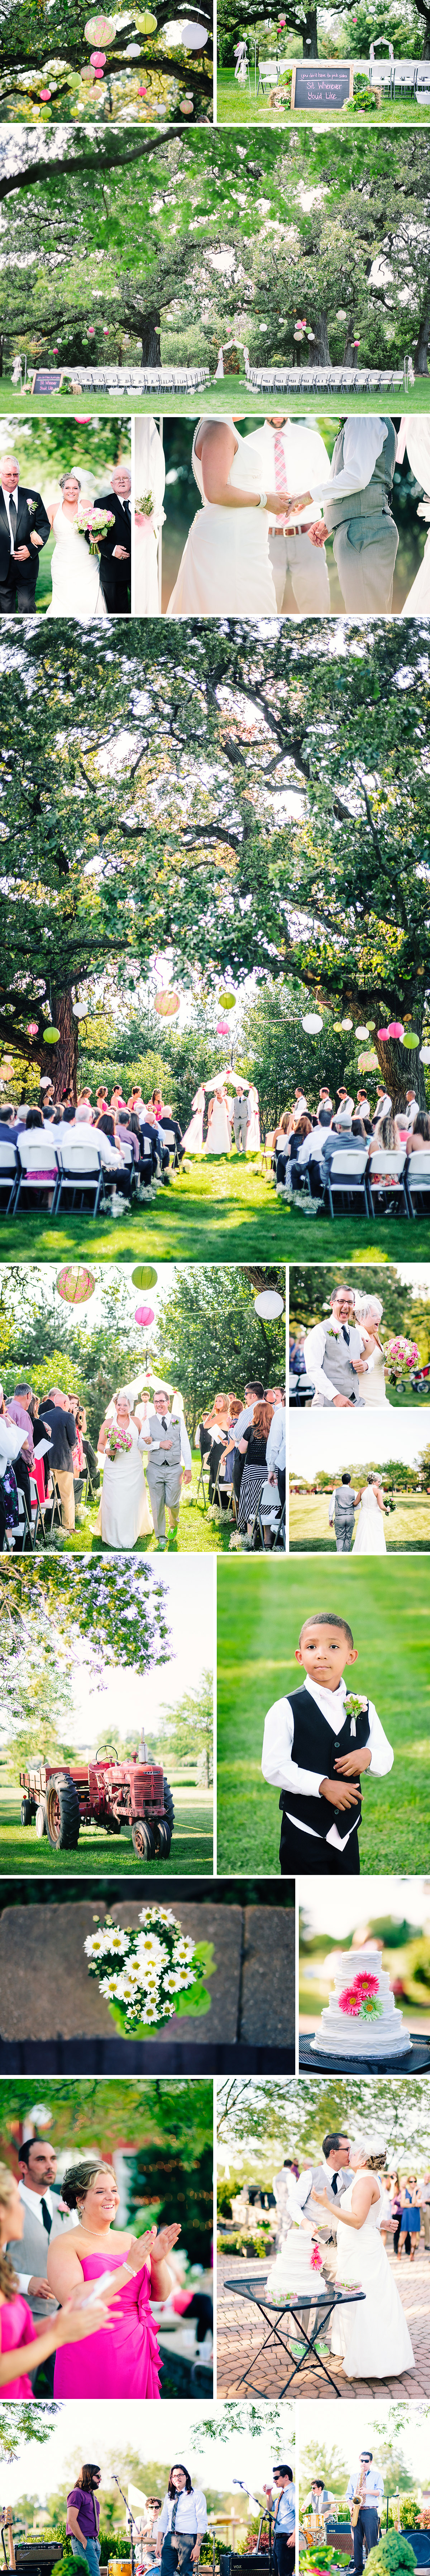 Chicago_Fine_Art_Wedding_Photography_andy-tori3.jpg